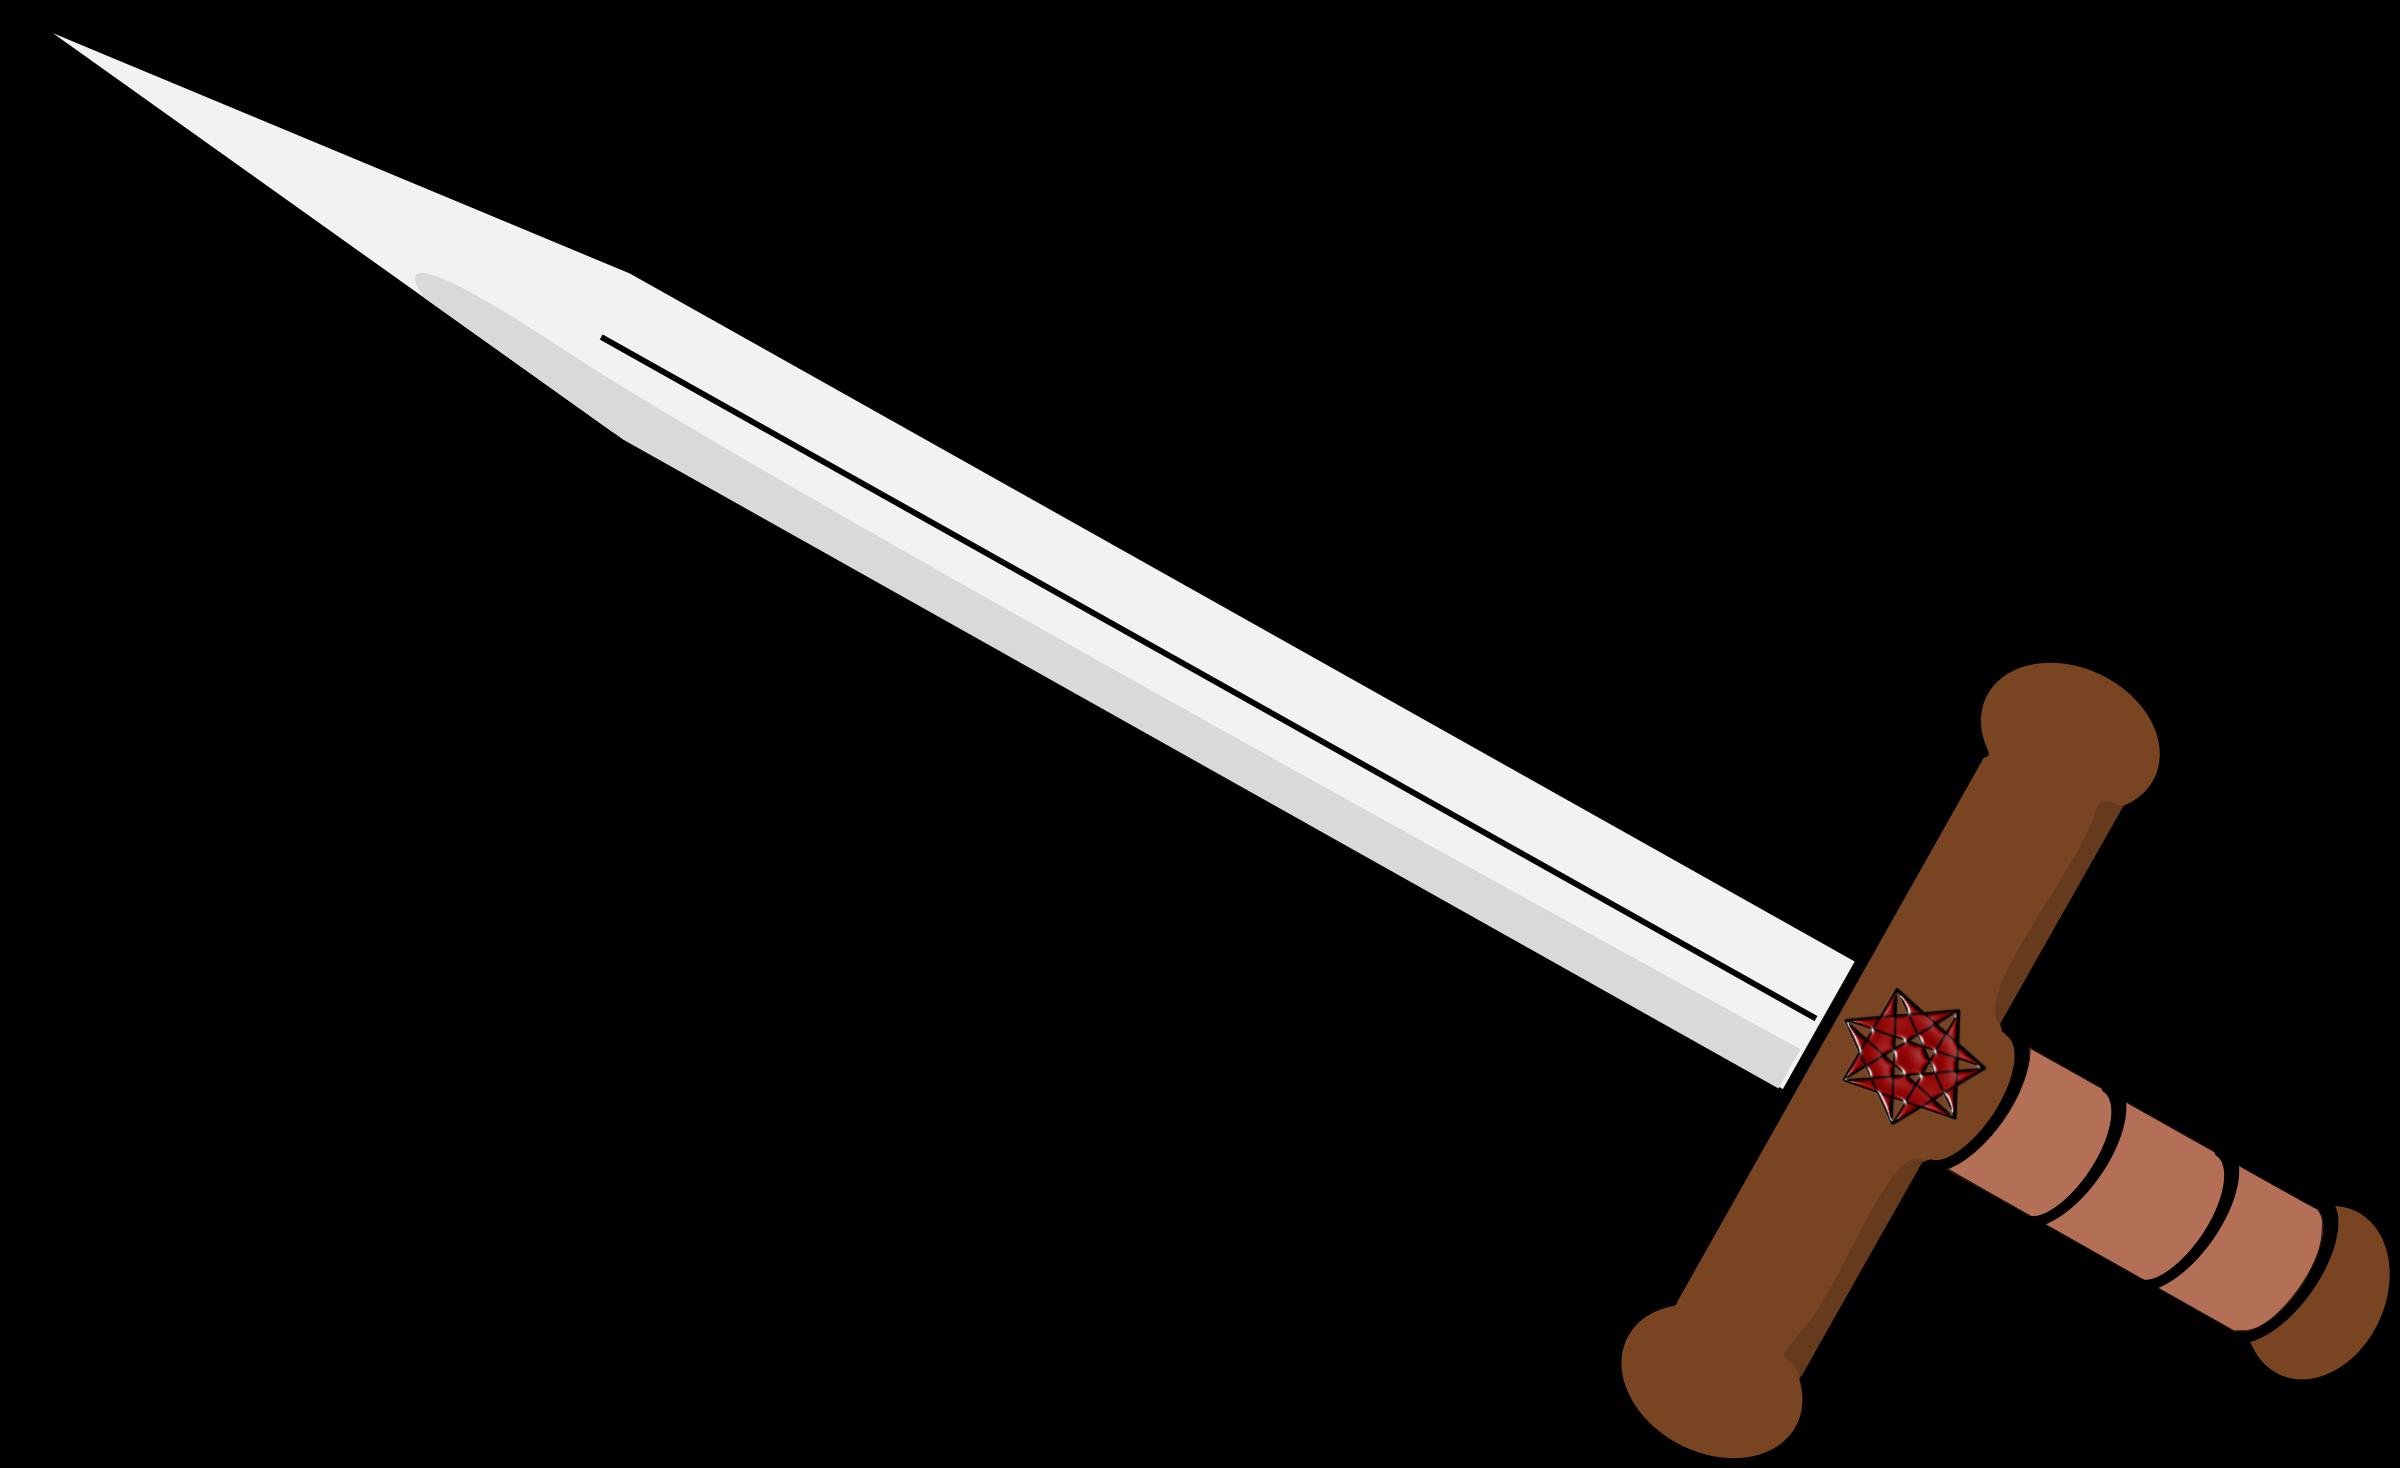 Warrior sword clipart jpg royalty free Sword Png | Free download best Sword Png on ClipArtMag.com jpg royalty free